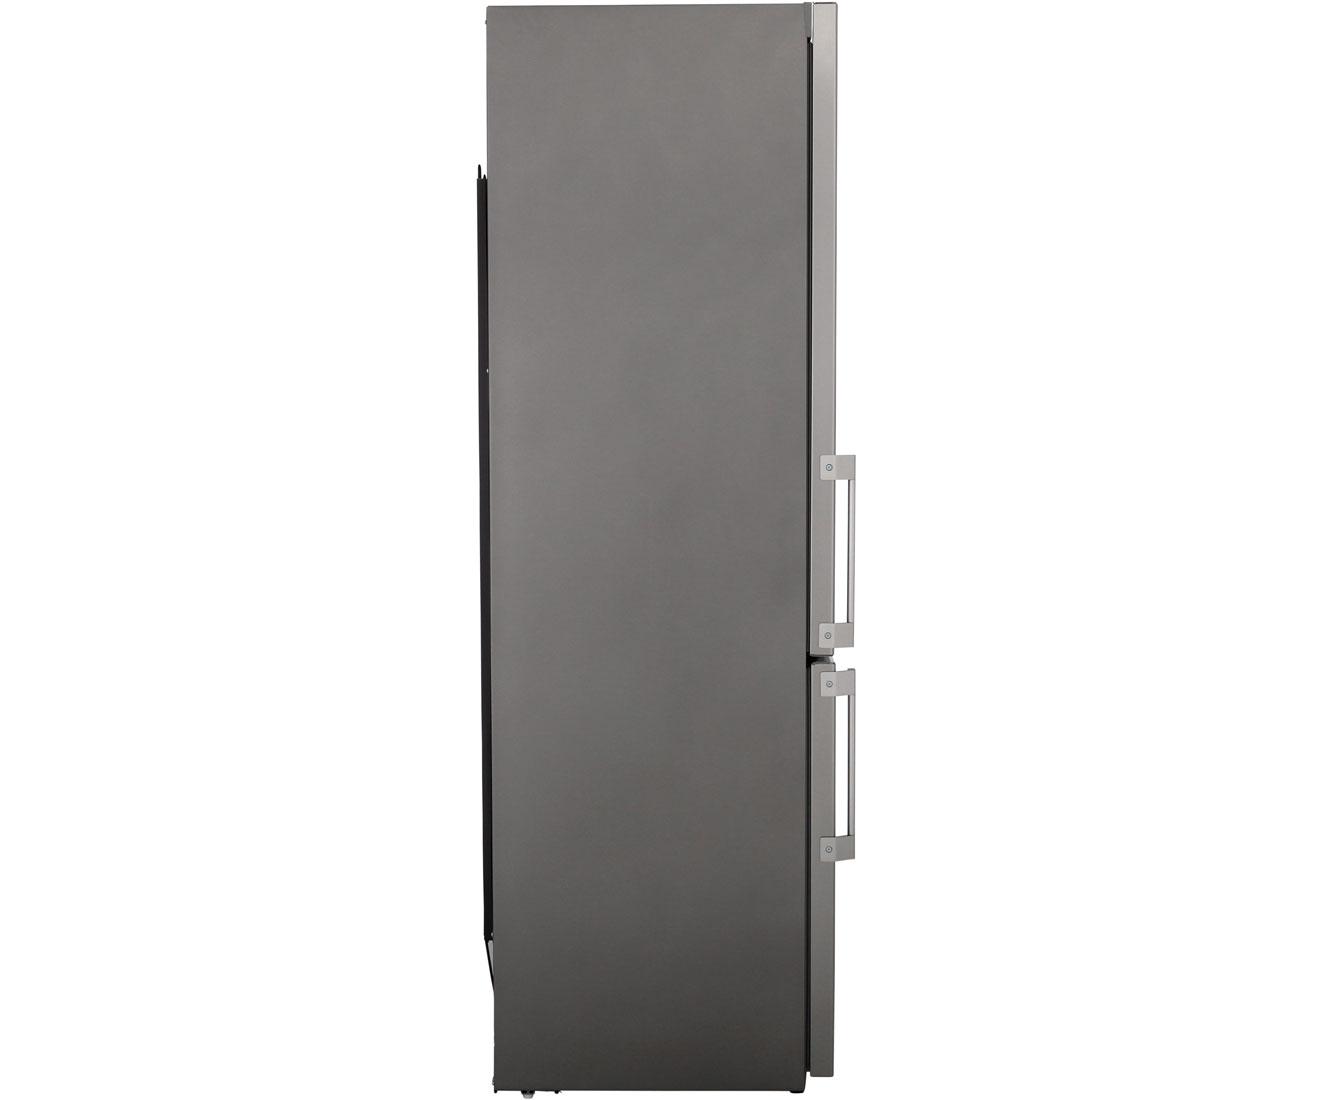 bauknecht kgnf 20p a3 in k hl gefrierkombination no frost freistehend ebay. Black Bedroom Furniture Sets. Home Design Ideas